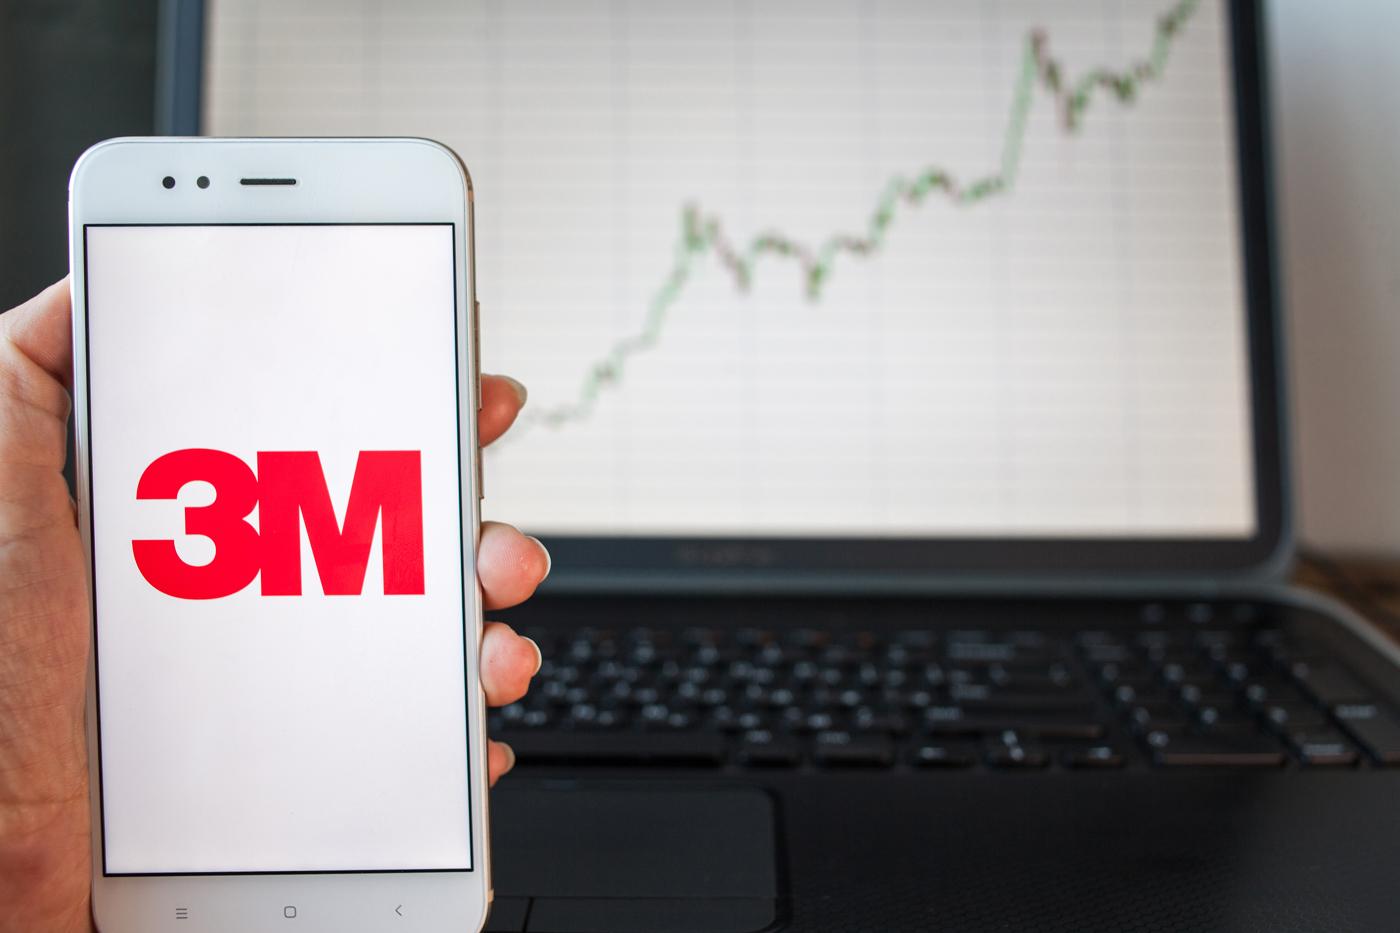 3M stock, MMM stock, MMM stock news, 3M stock news